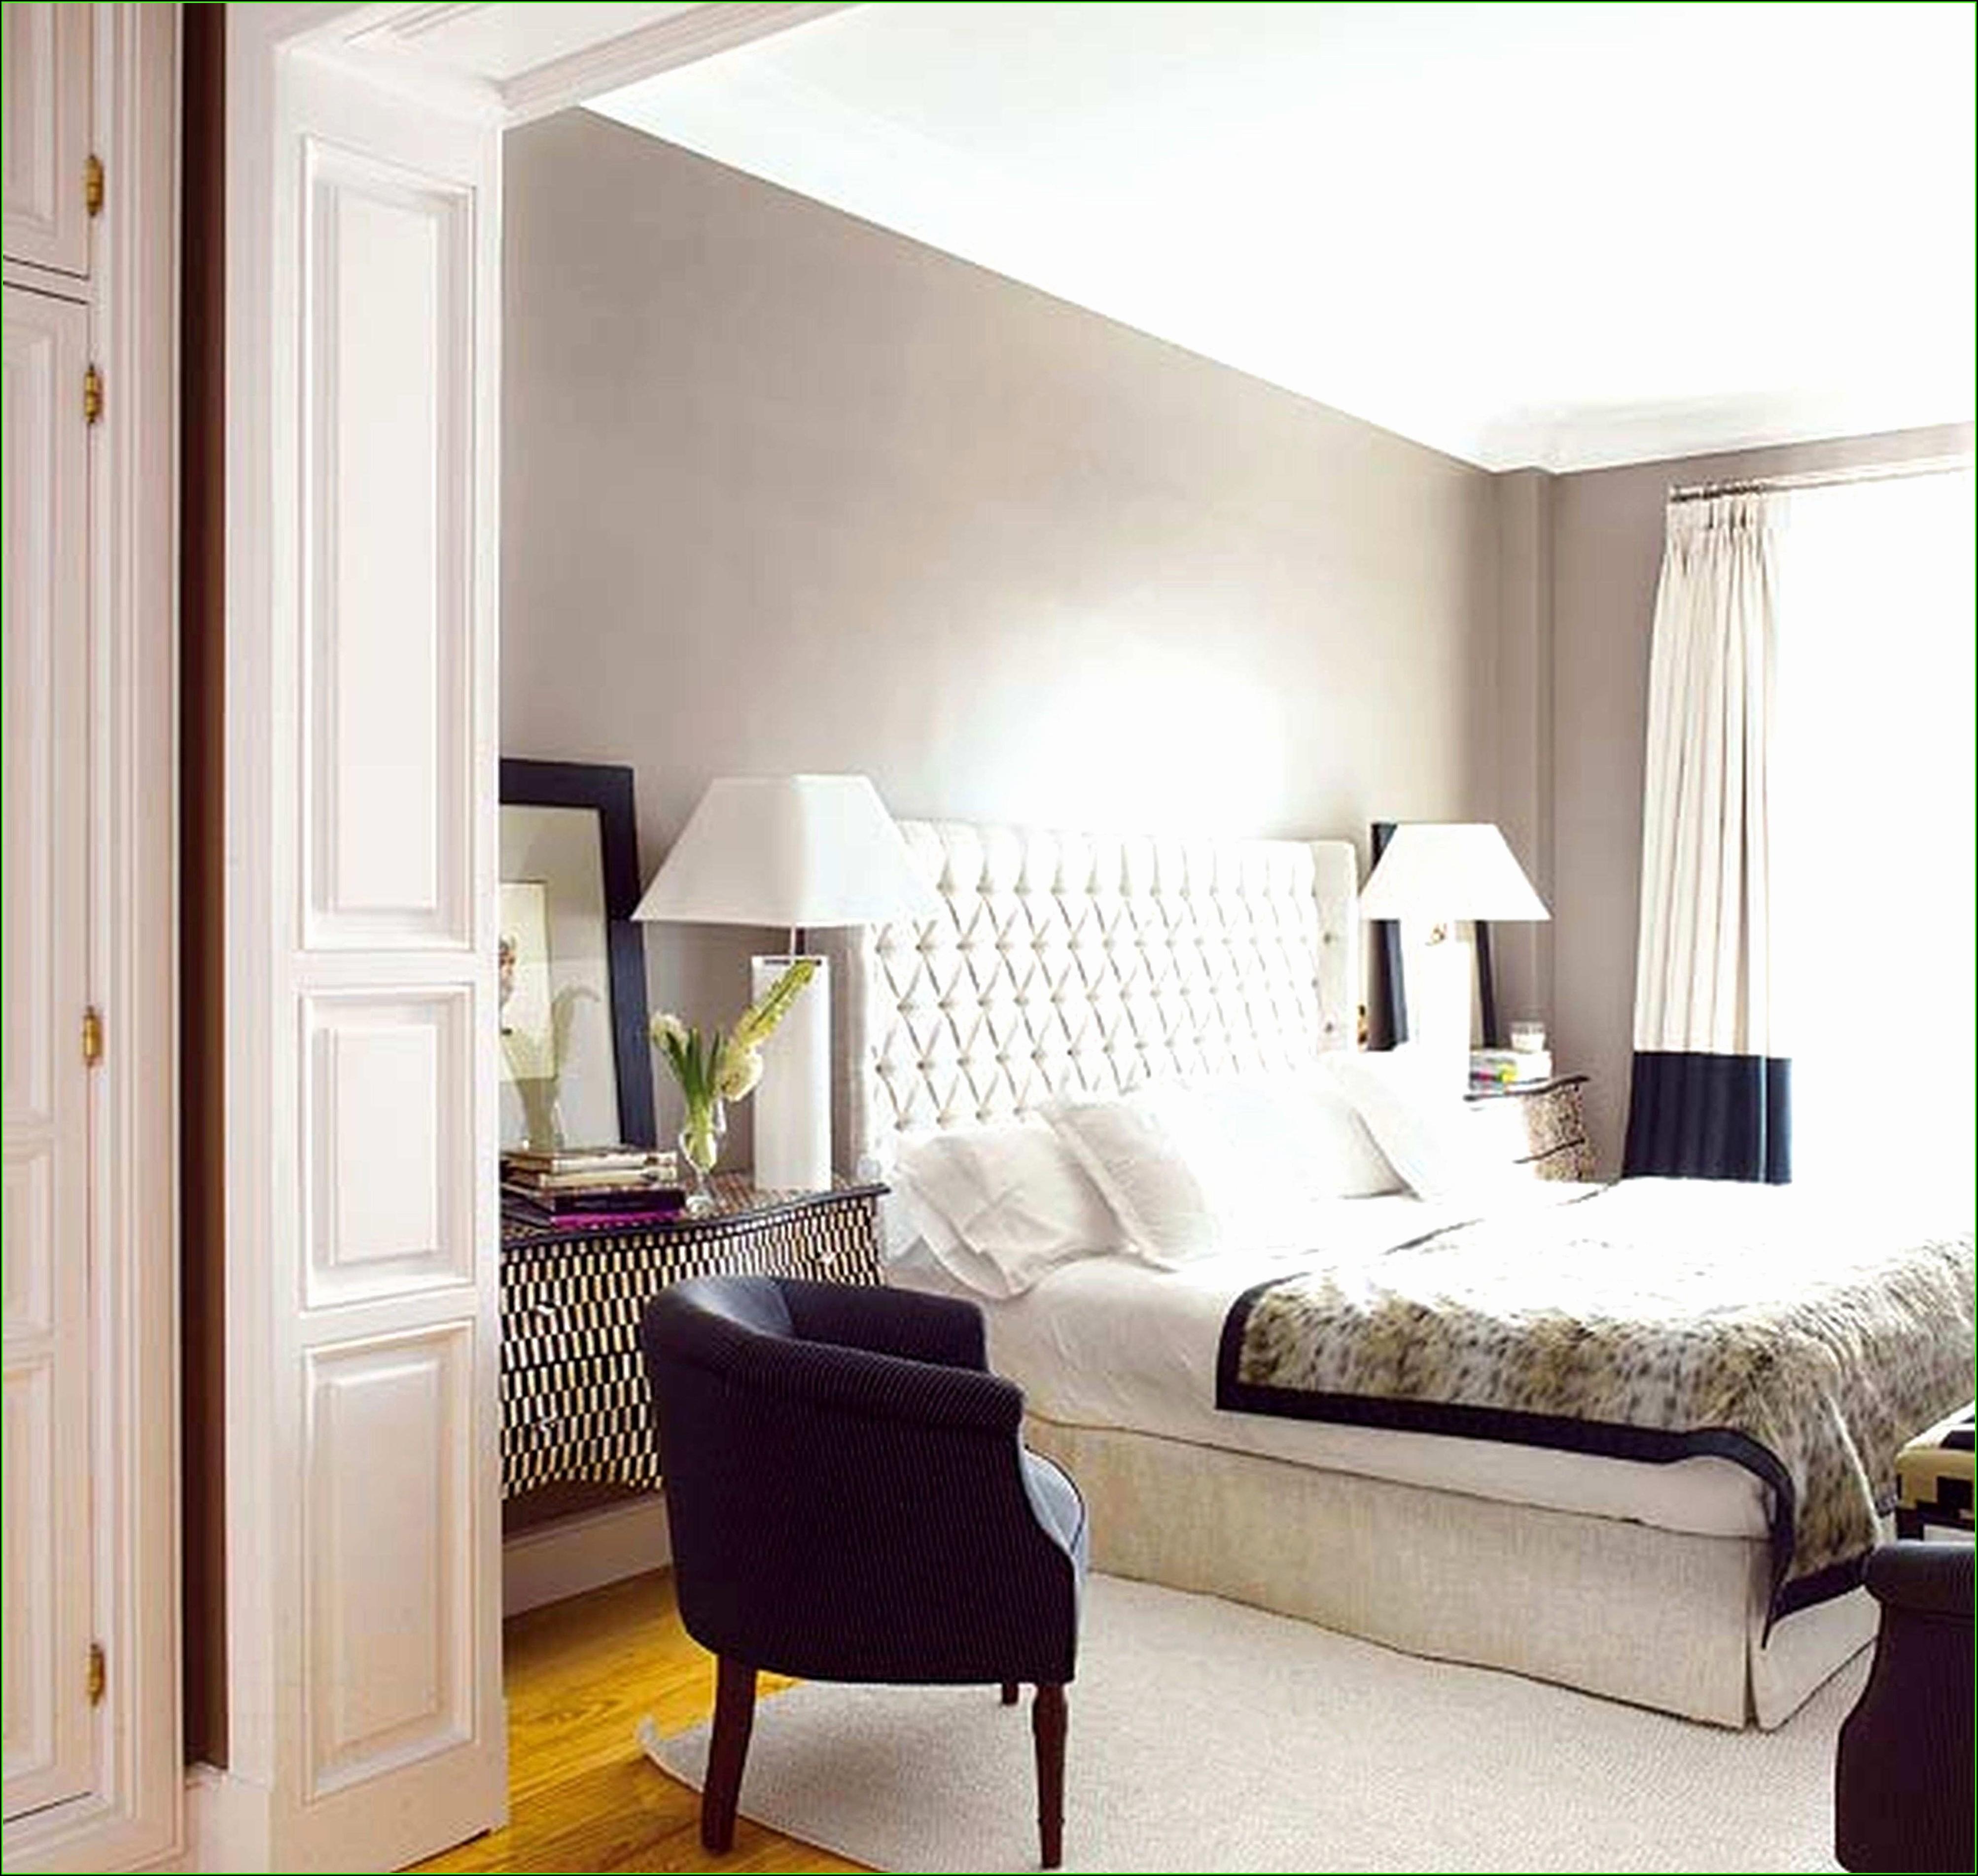 Wandgestaltung Ideen Selber Machen Schlafzimmer